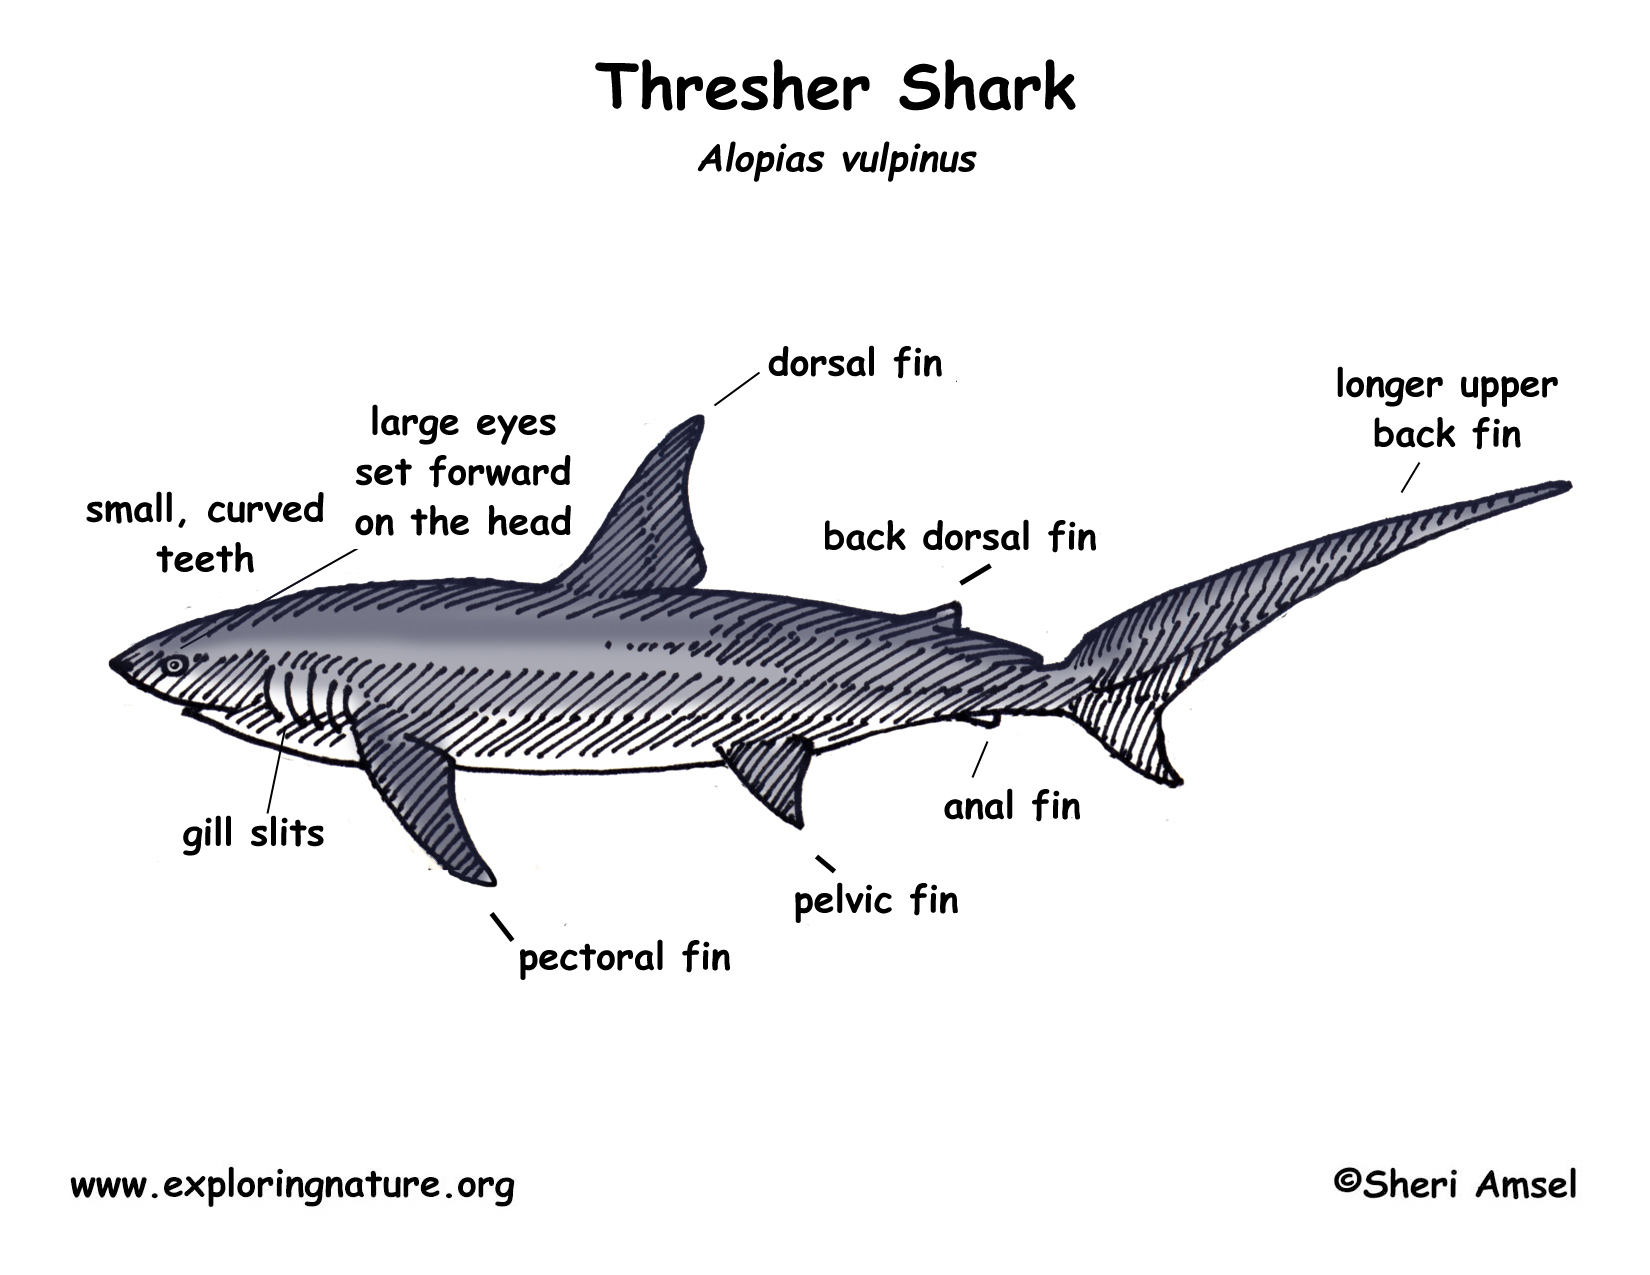 External Anatomy Of A Dogfish Shark Choice Image - human body anatomy